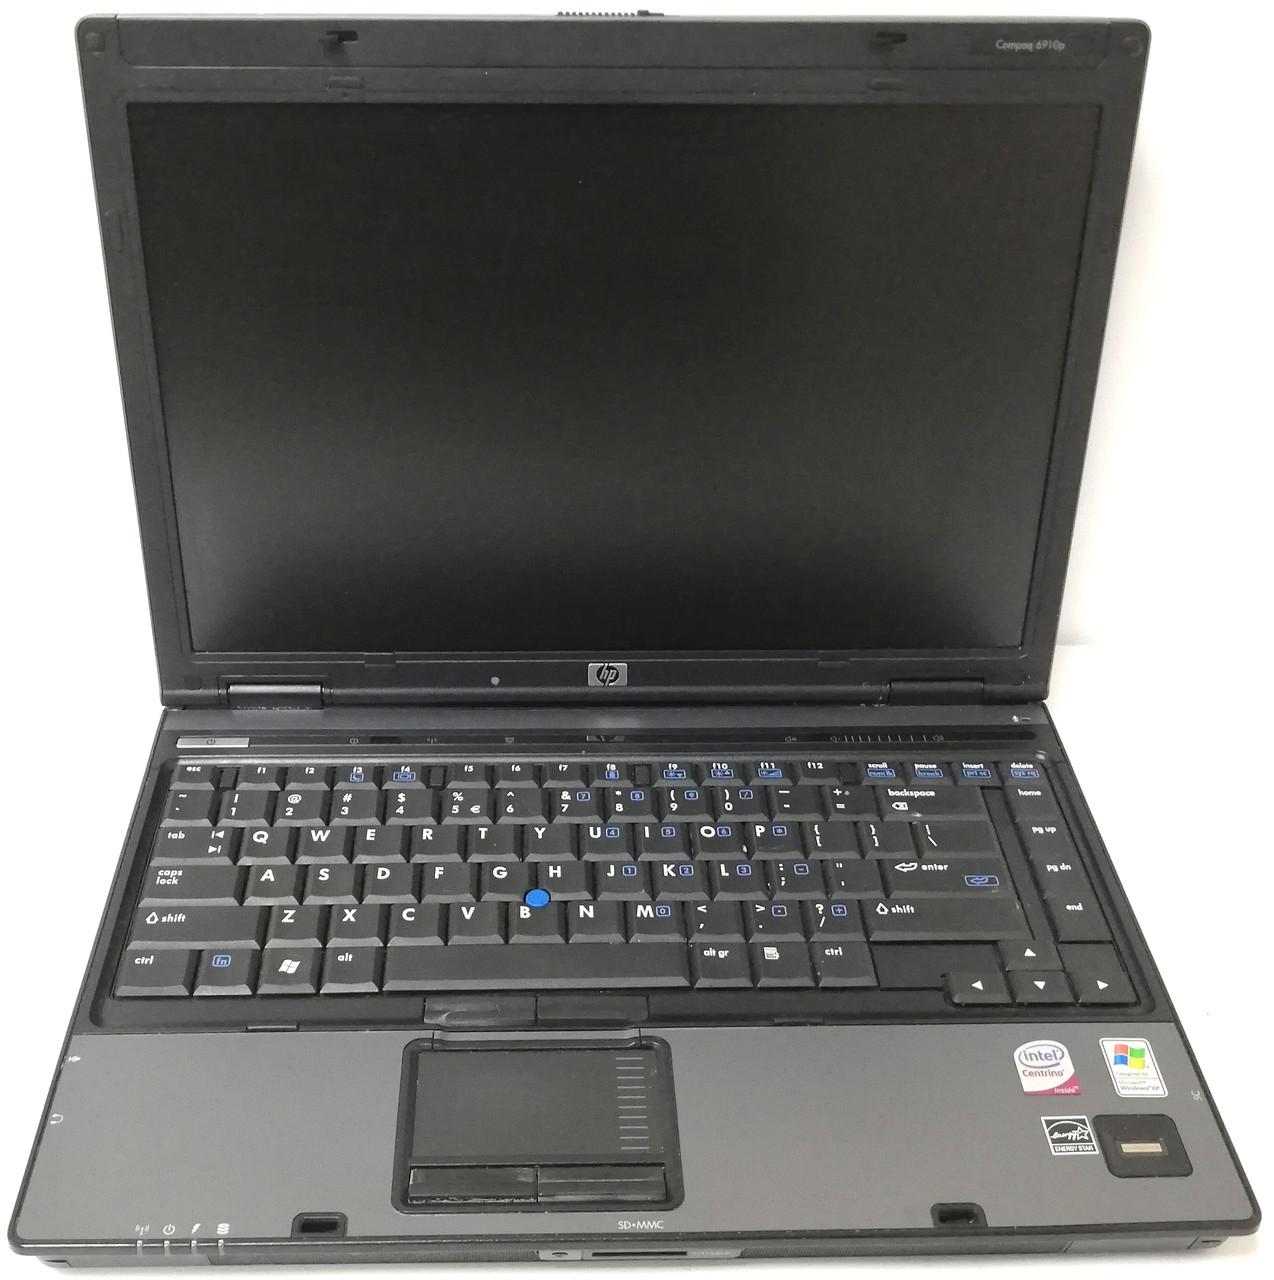 "Ноутбук HP Compaq 6910P 14.1"" Intel Core 2 Duo T7500 2,2 ГГц 1 ГБ Б/У"